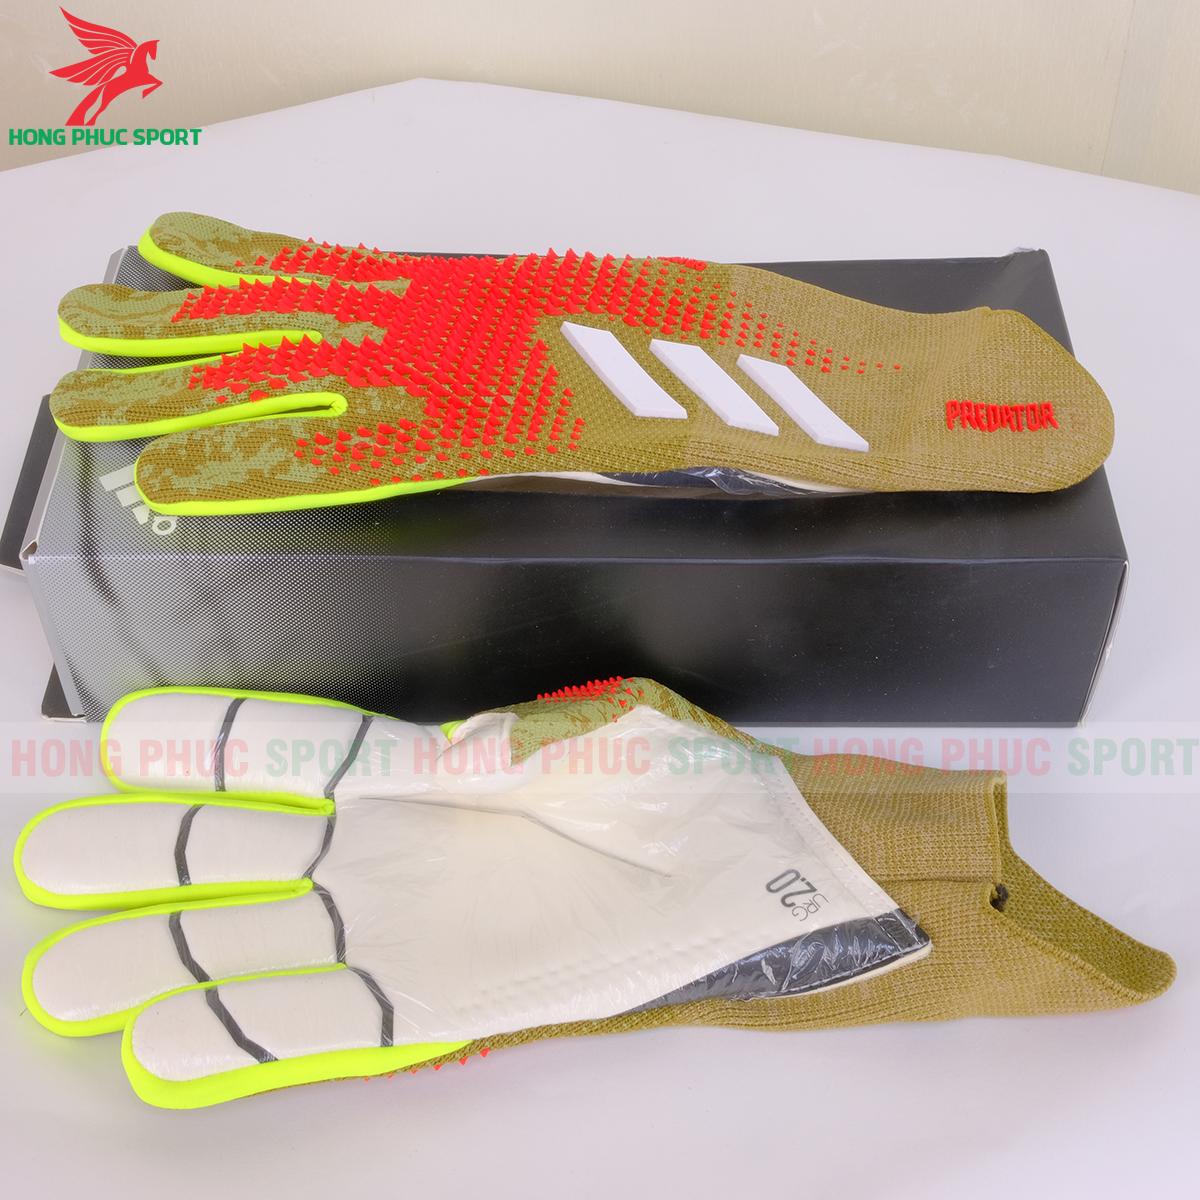 Găng tay Adidas Predator Pro GL Mutator URG 2.0 mẫu 1